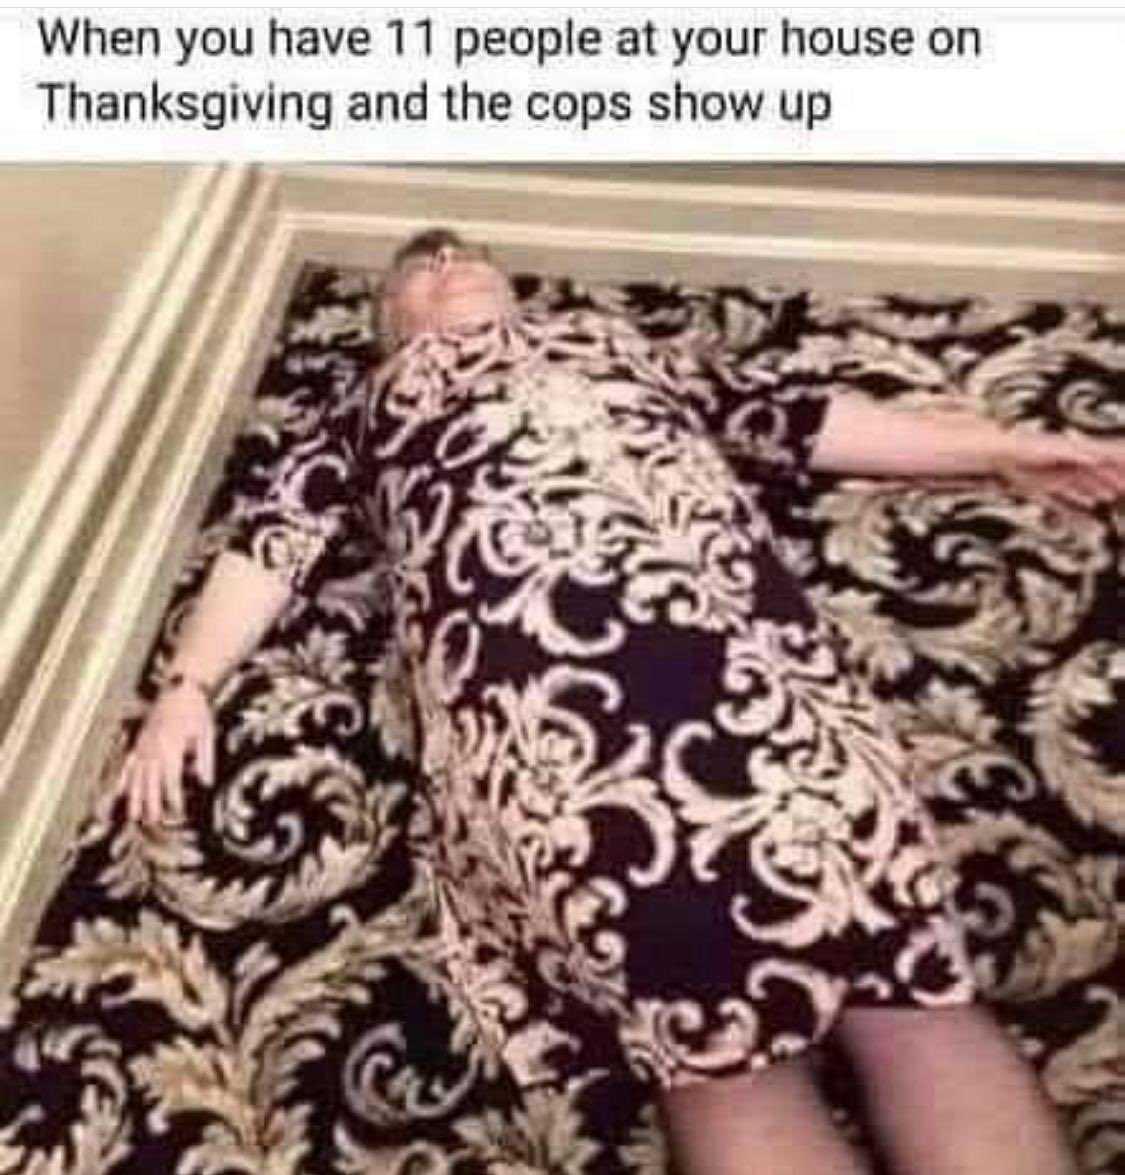 funny thanksgiving meme - hiding in plain sight